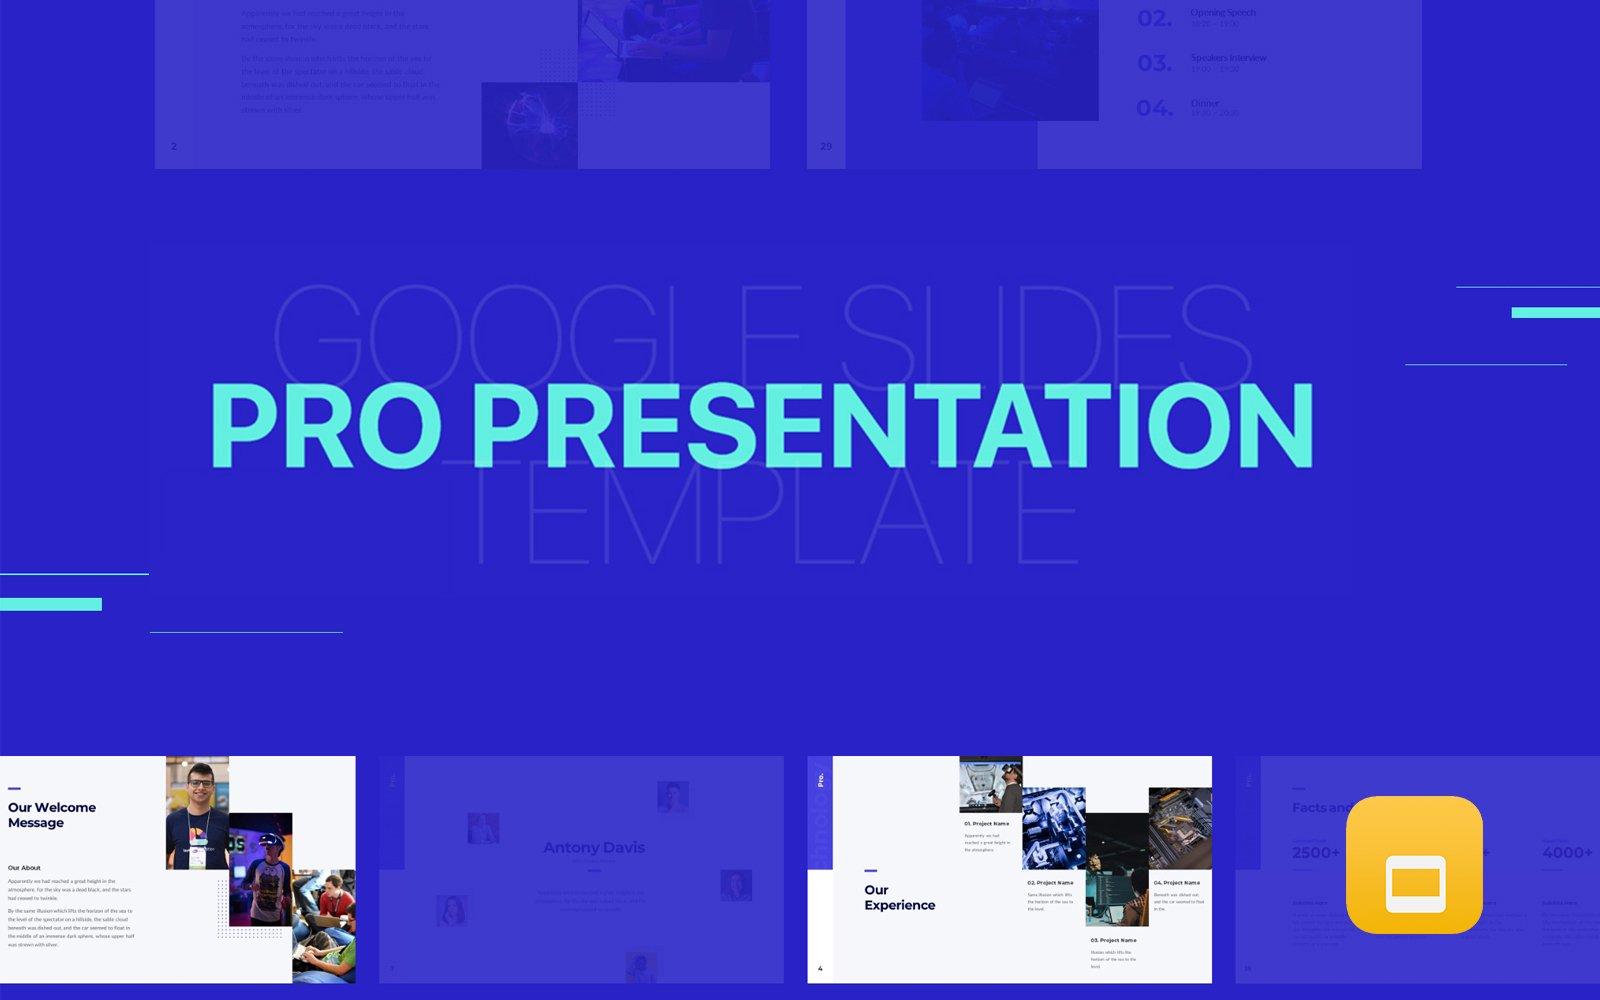 Pro Presentation - Animated Google Slides